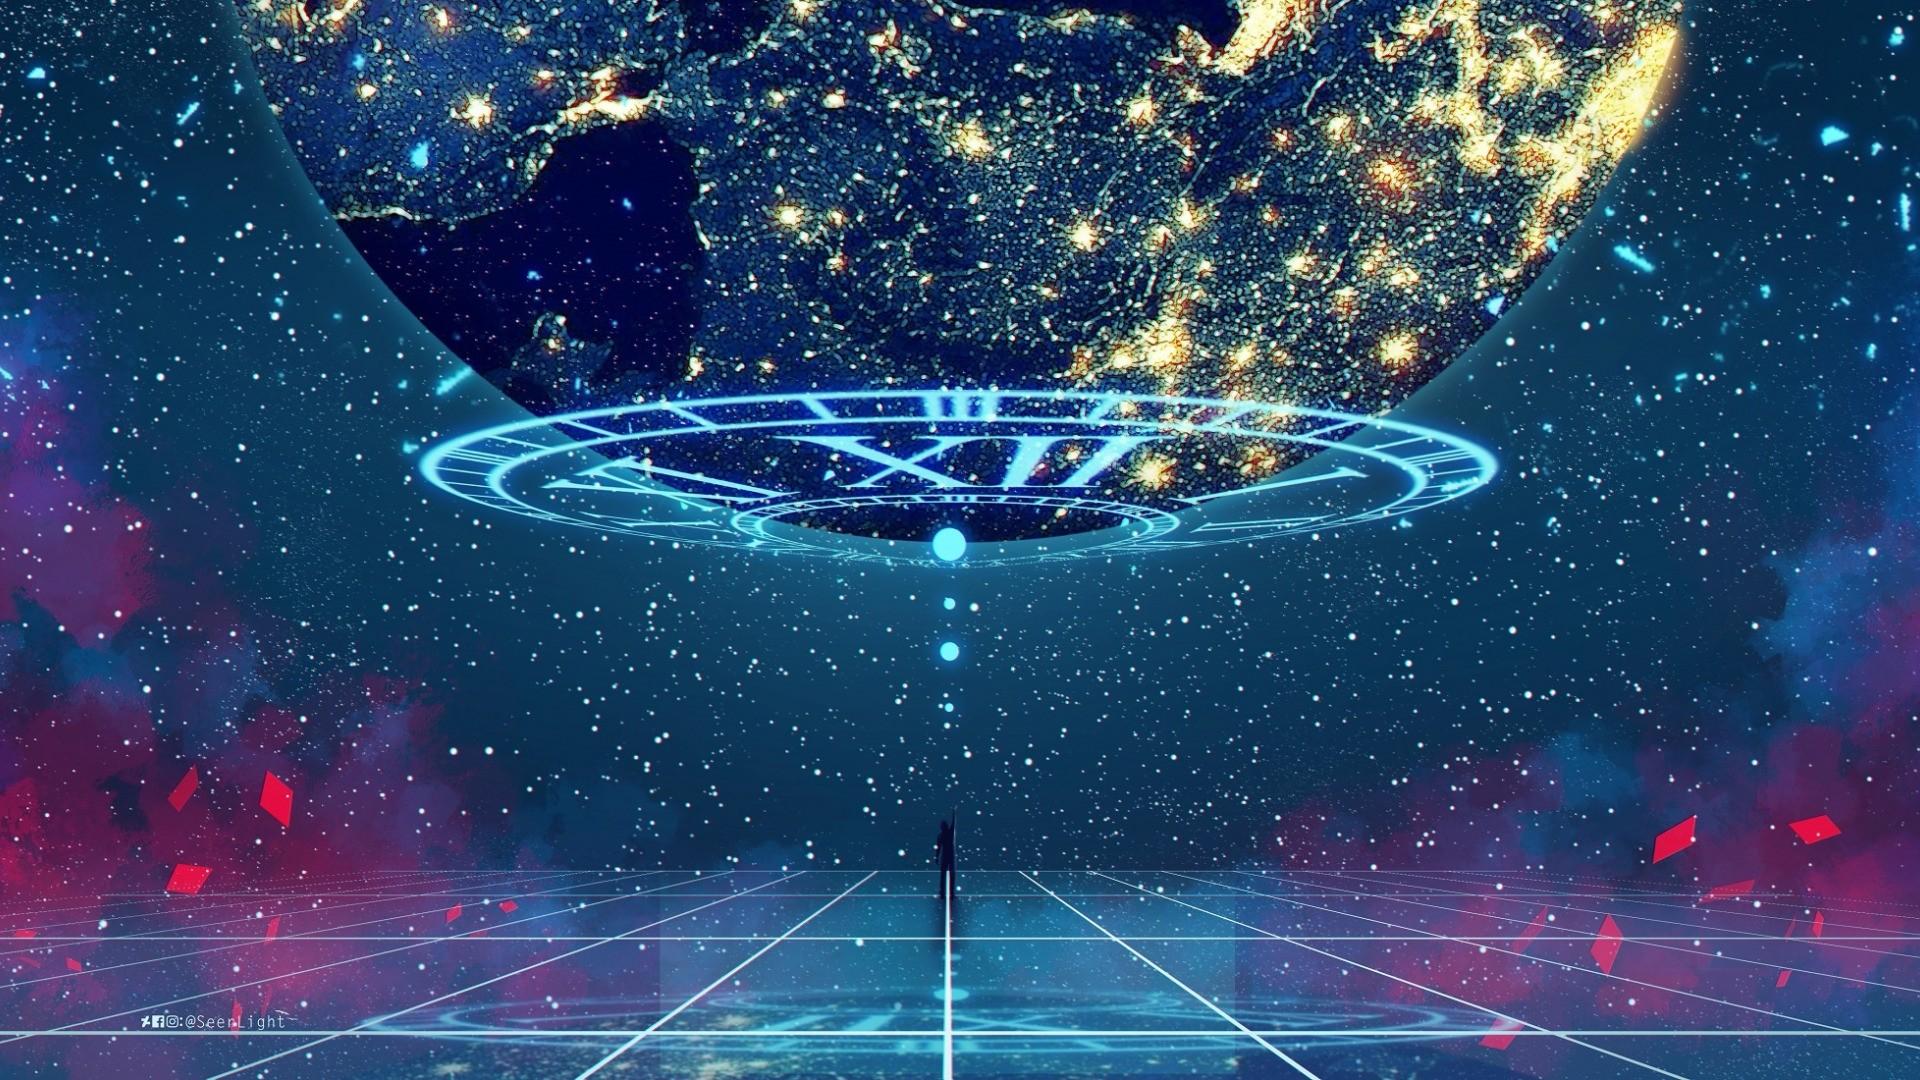 Celestial Free Wallpaper